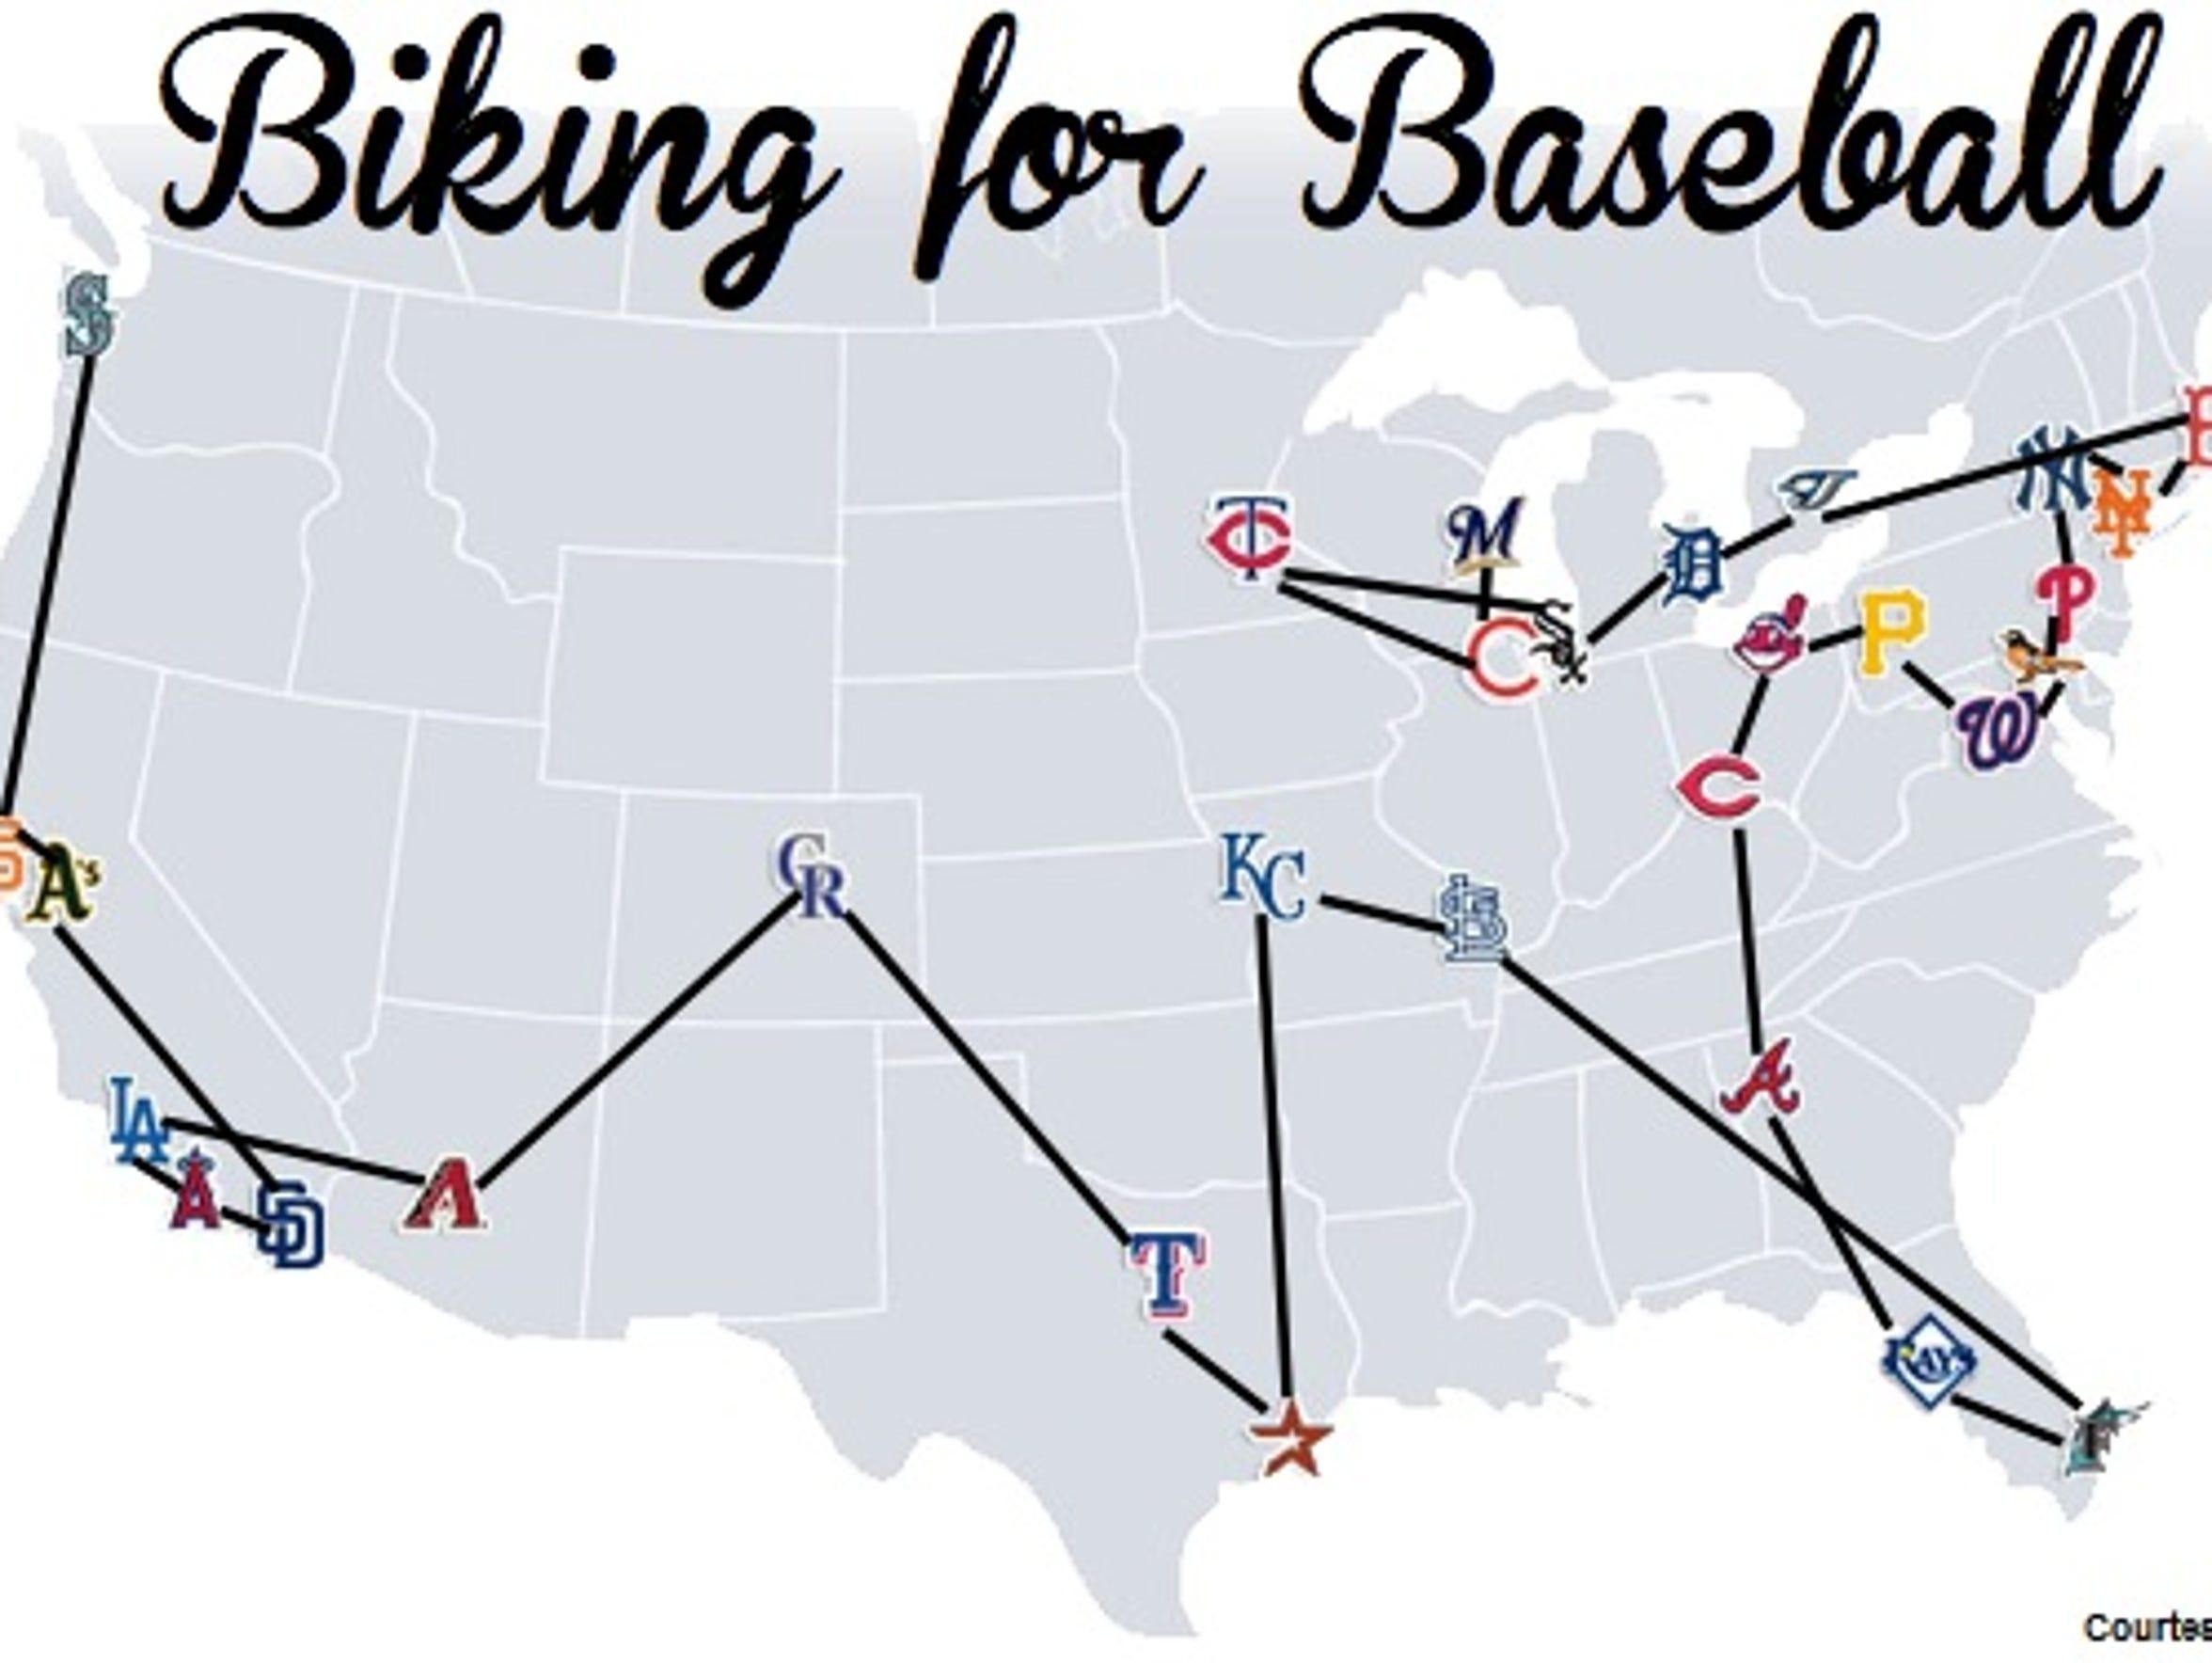 This map shows Matt Stoltz's Biking for Baseball route.